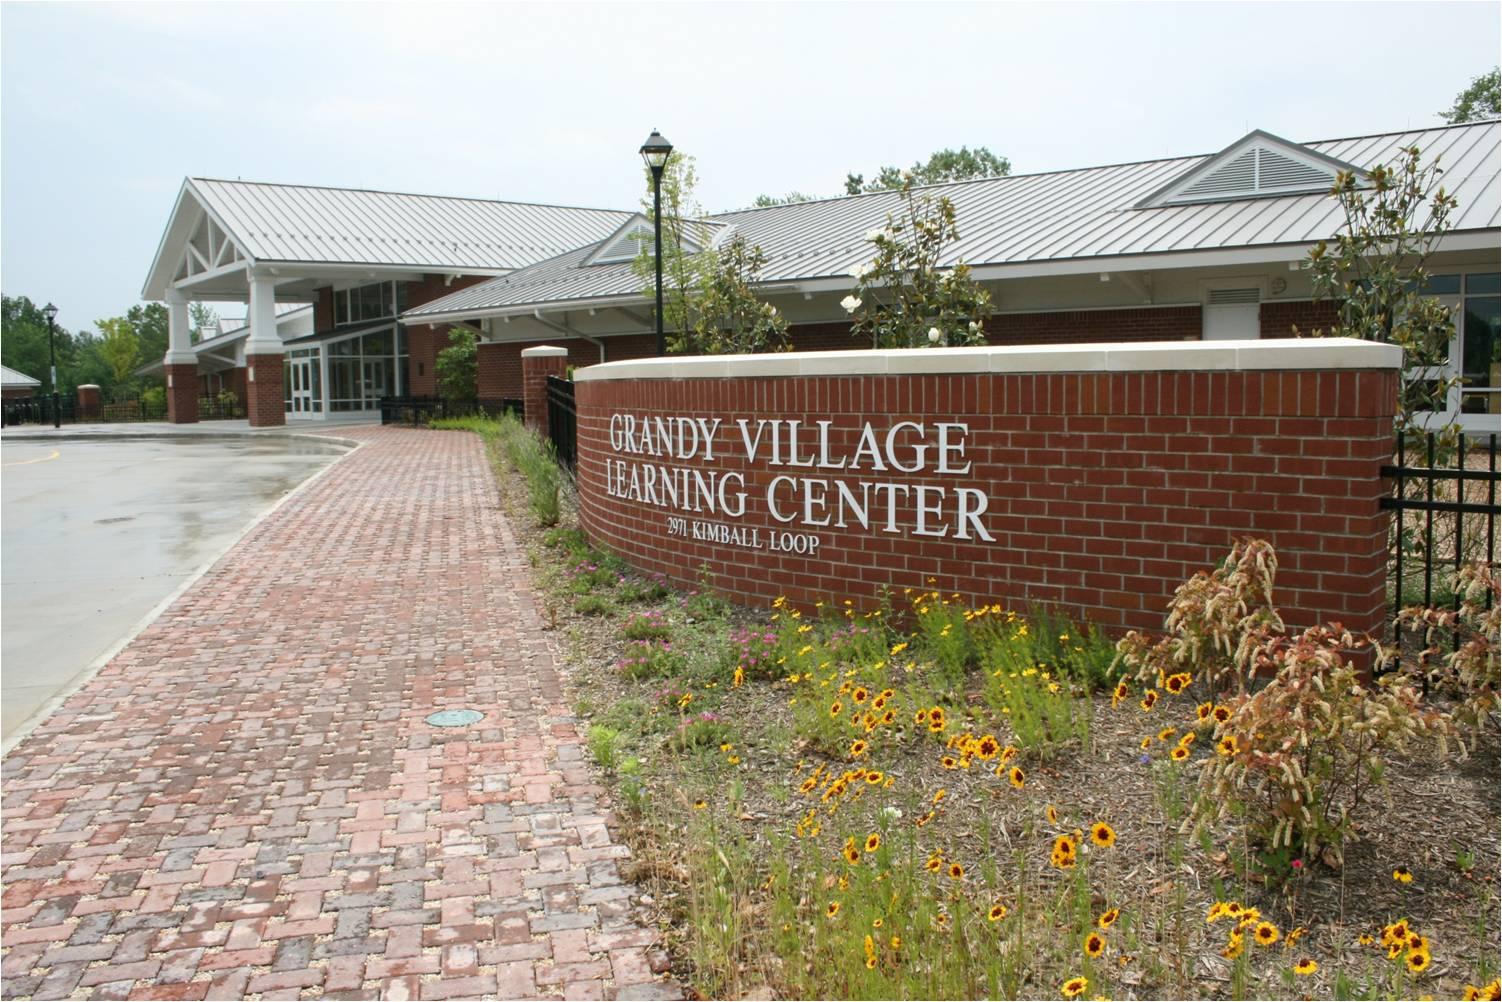 Grandy Village Learning Center